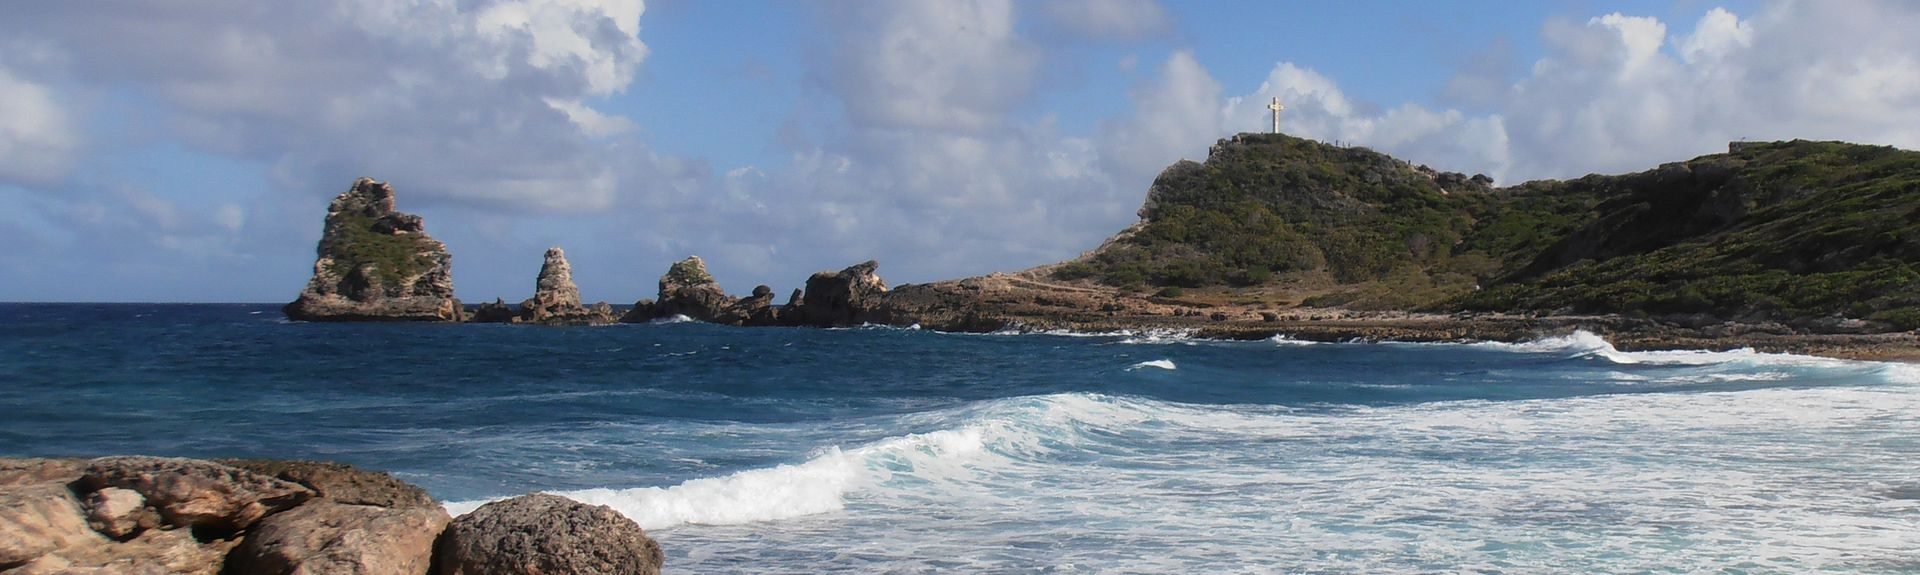 Morne-A-l'Eau, Guadeloupe